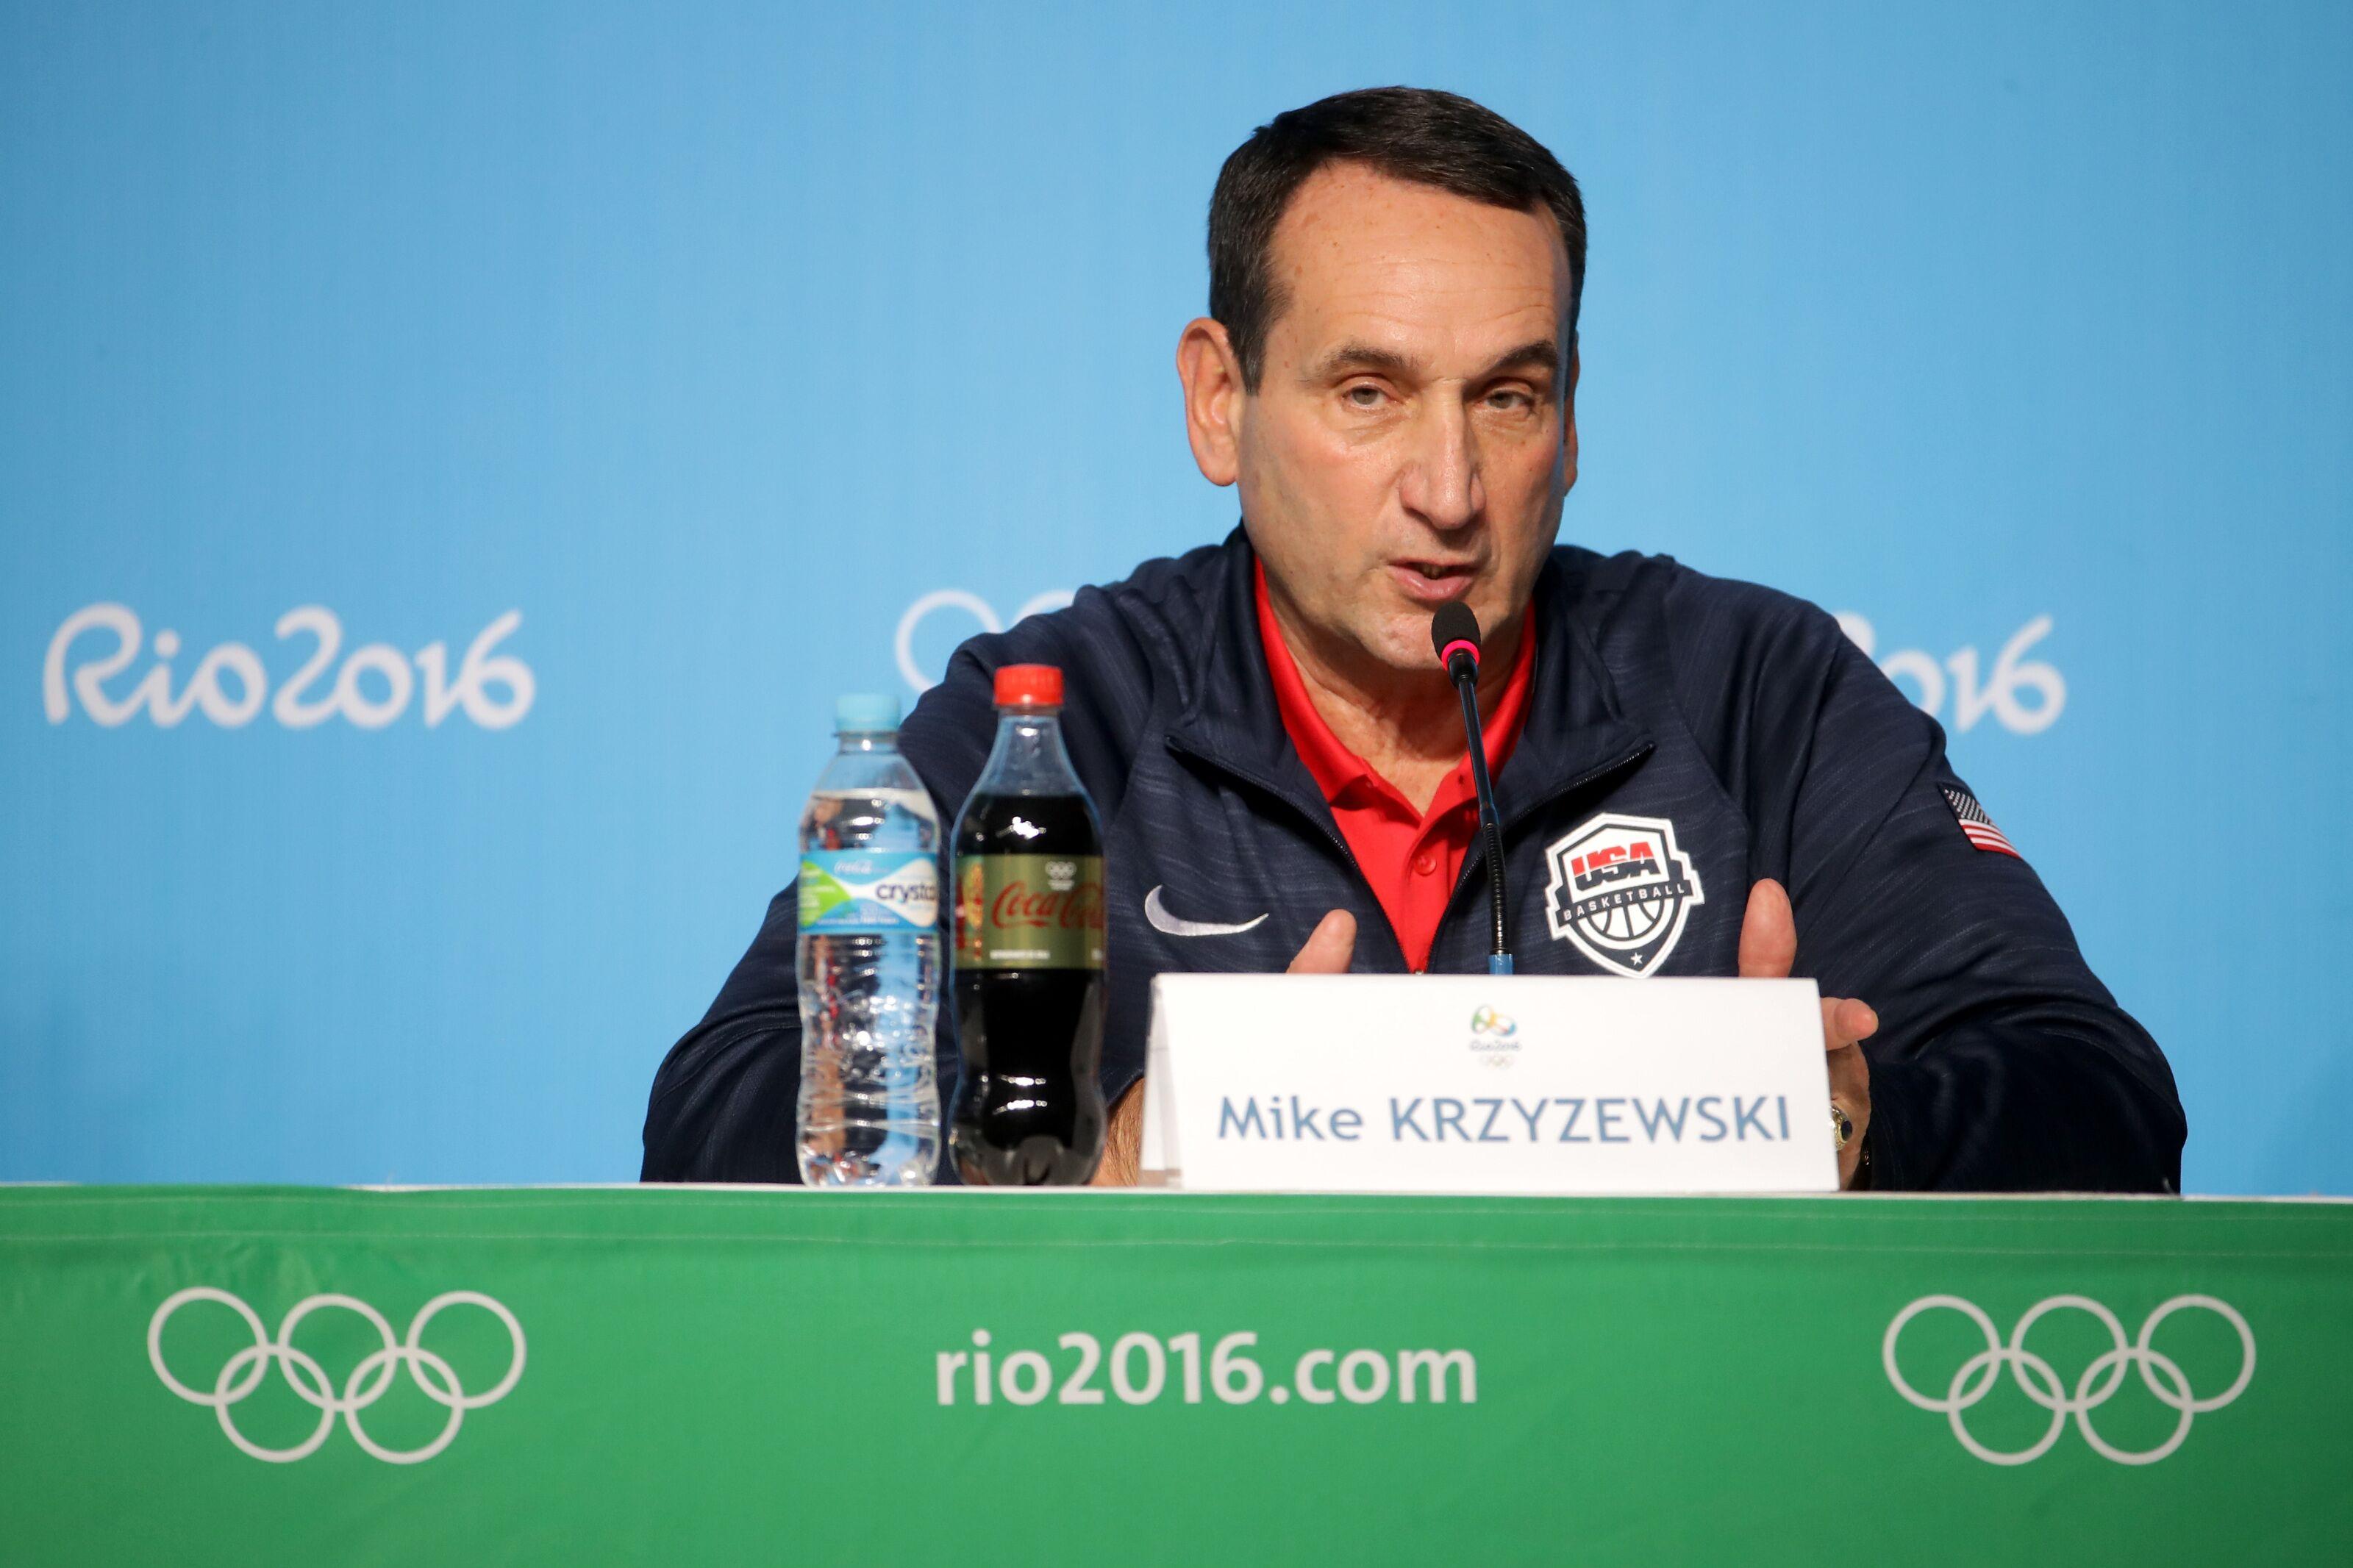 Team USA's loss shows Mike Krzyzewski is the best basketball coach